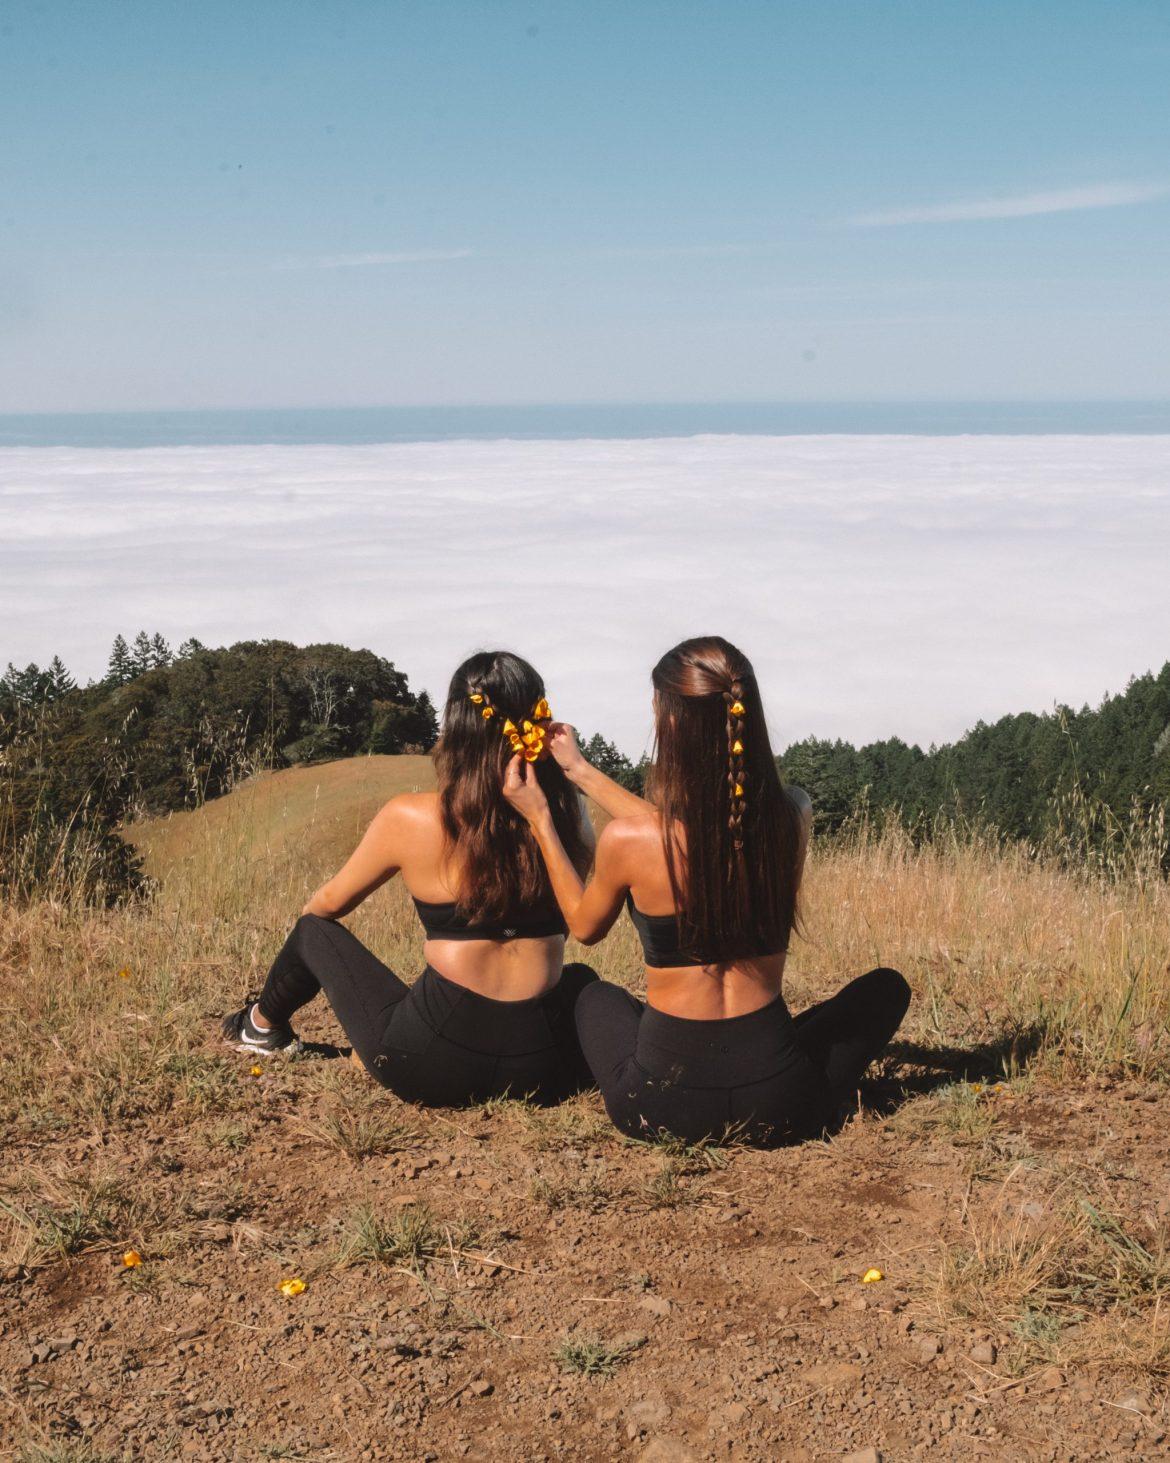 6 Epic Day Trips From San Francisco - Mount Tamalpais, Mount Tamalpais photography